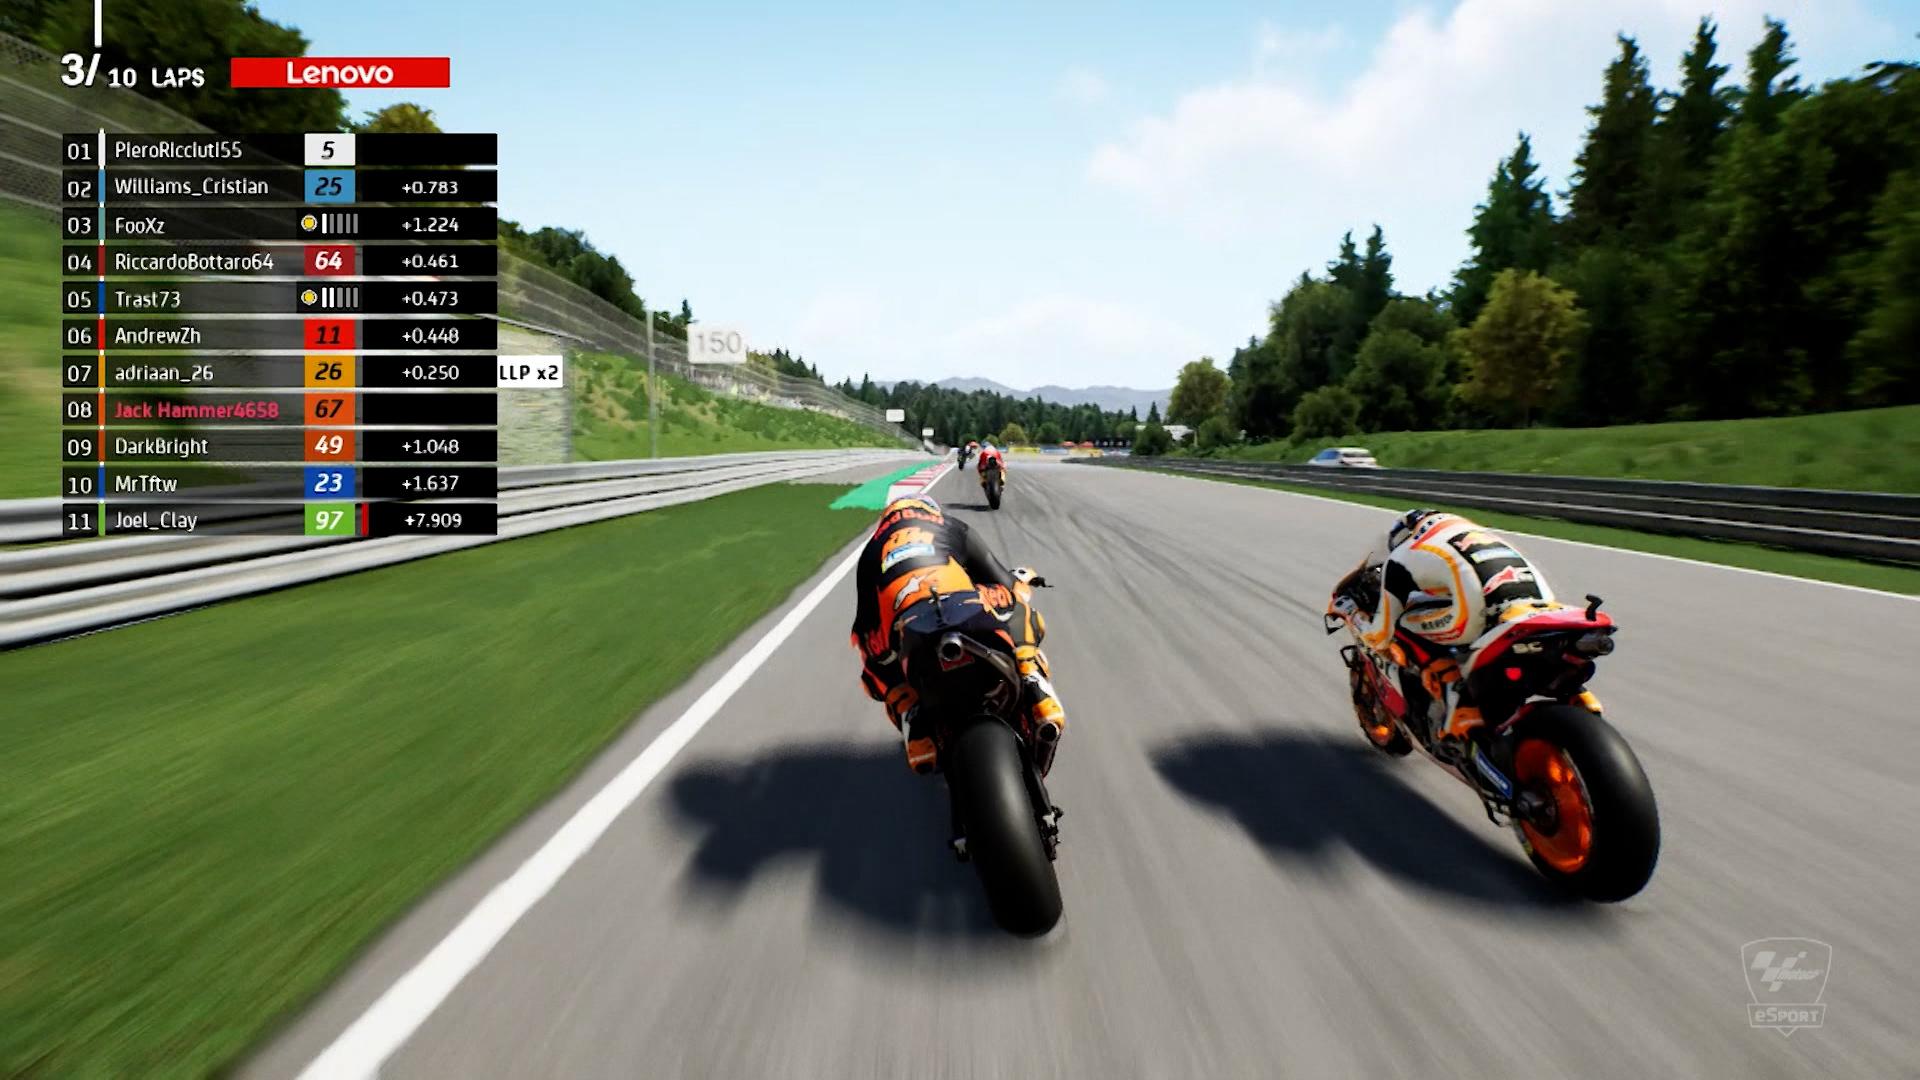 2021_MotoGP_00_GS2_eSPORTS_GLOBALSERIES_ROUND_02_PGM.00_41_55_11.Imagen-fija002